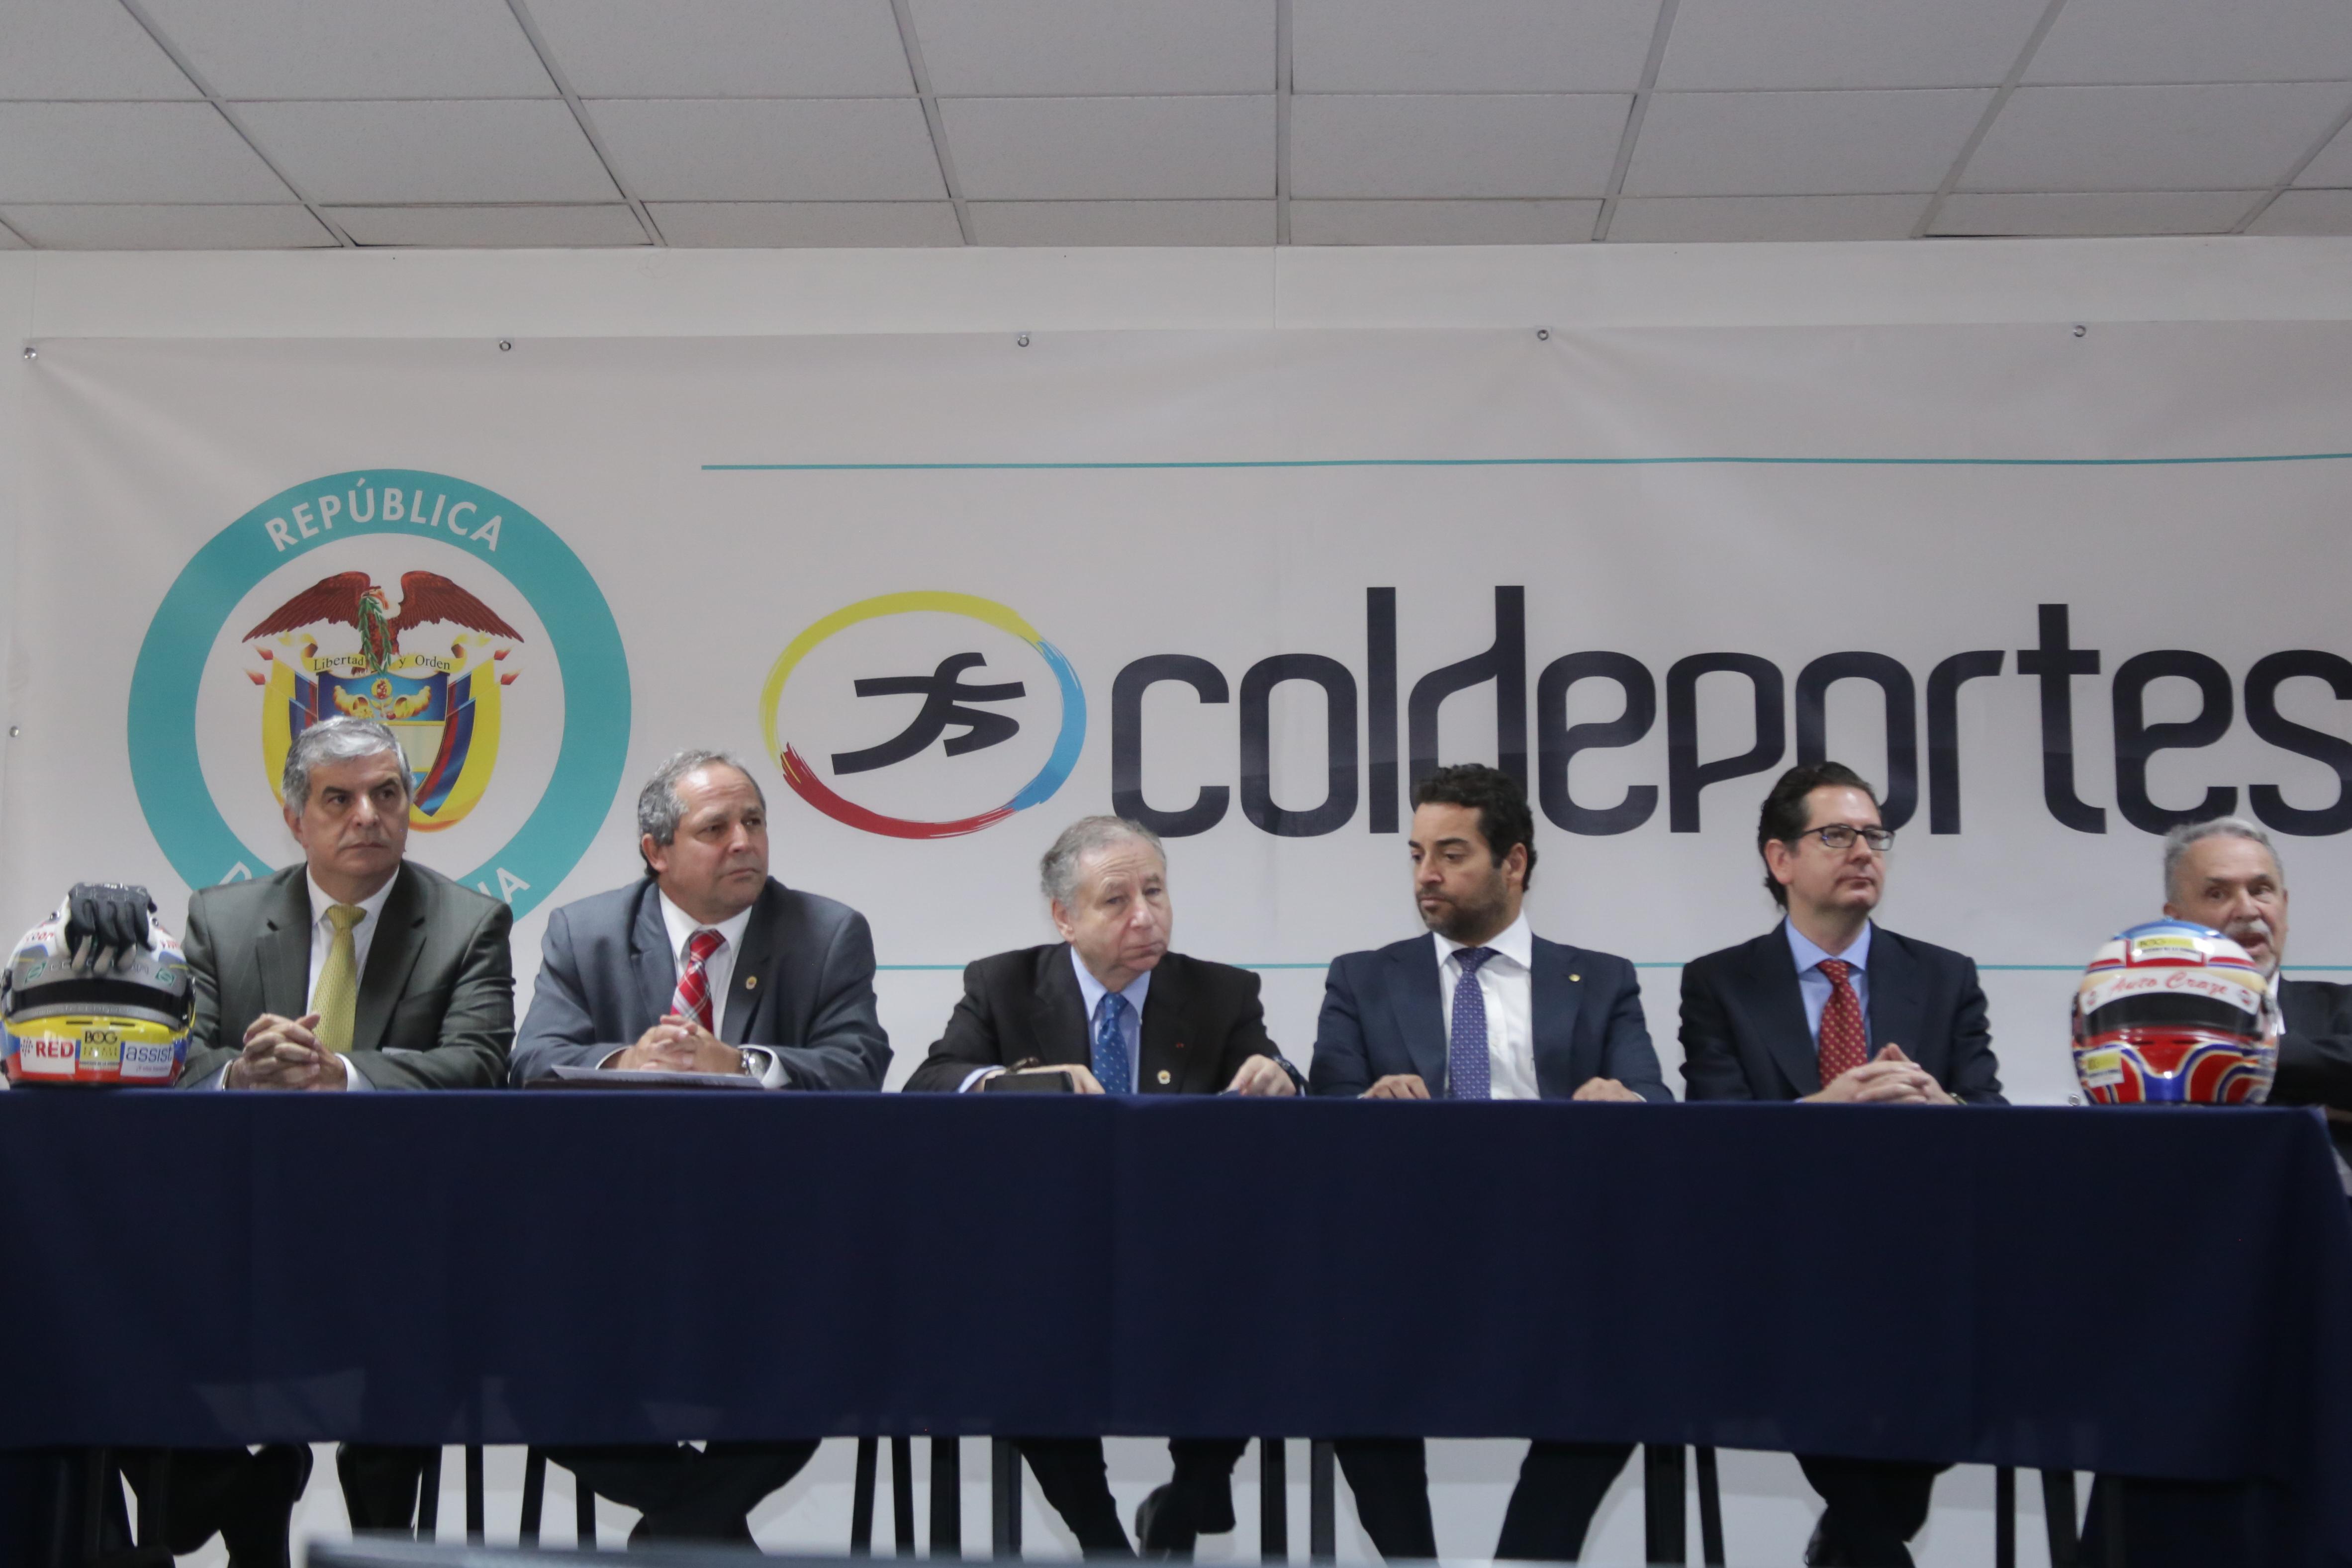 colombianos-rumbo-a-la-f1a